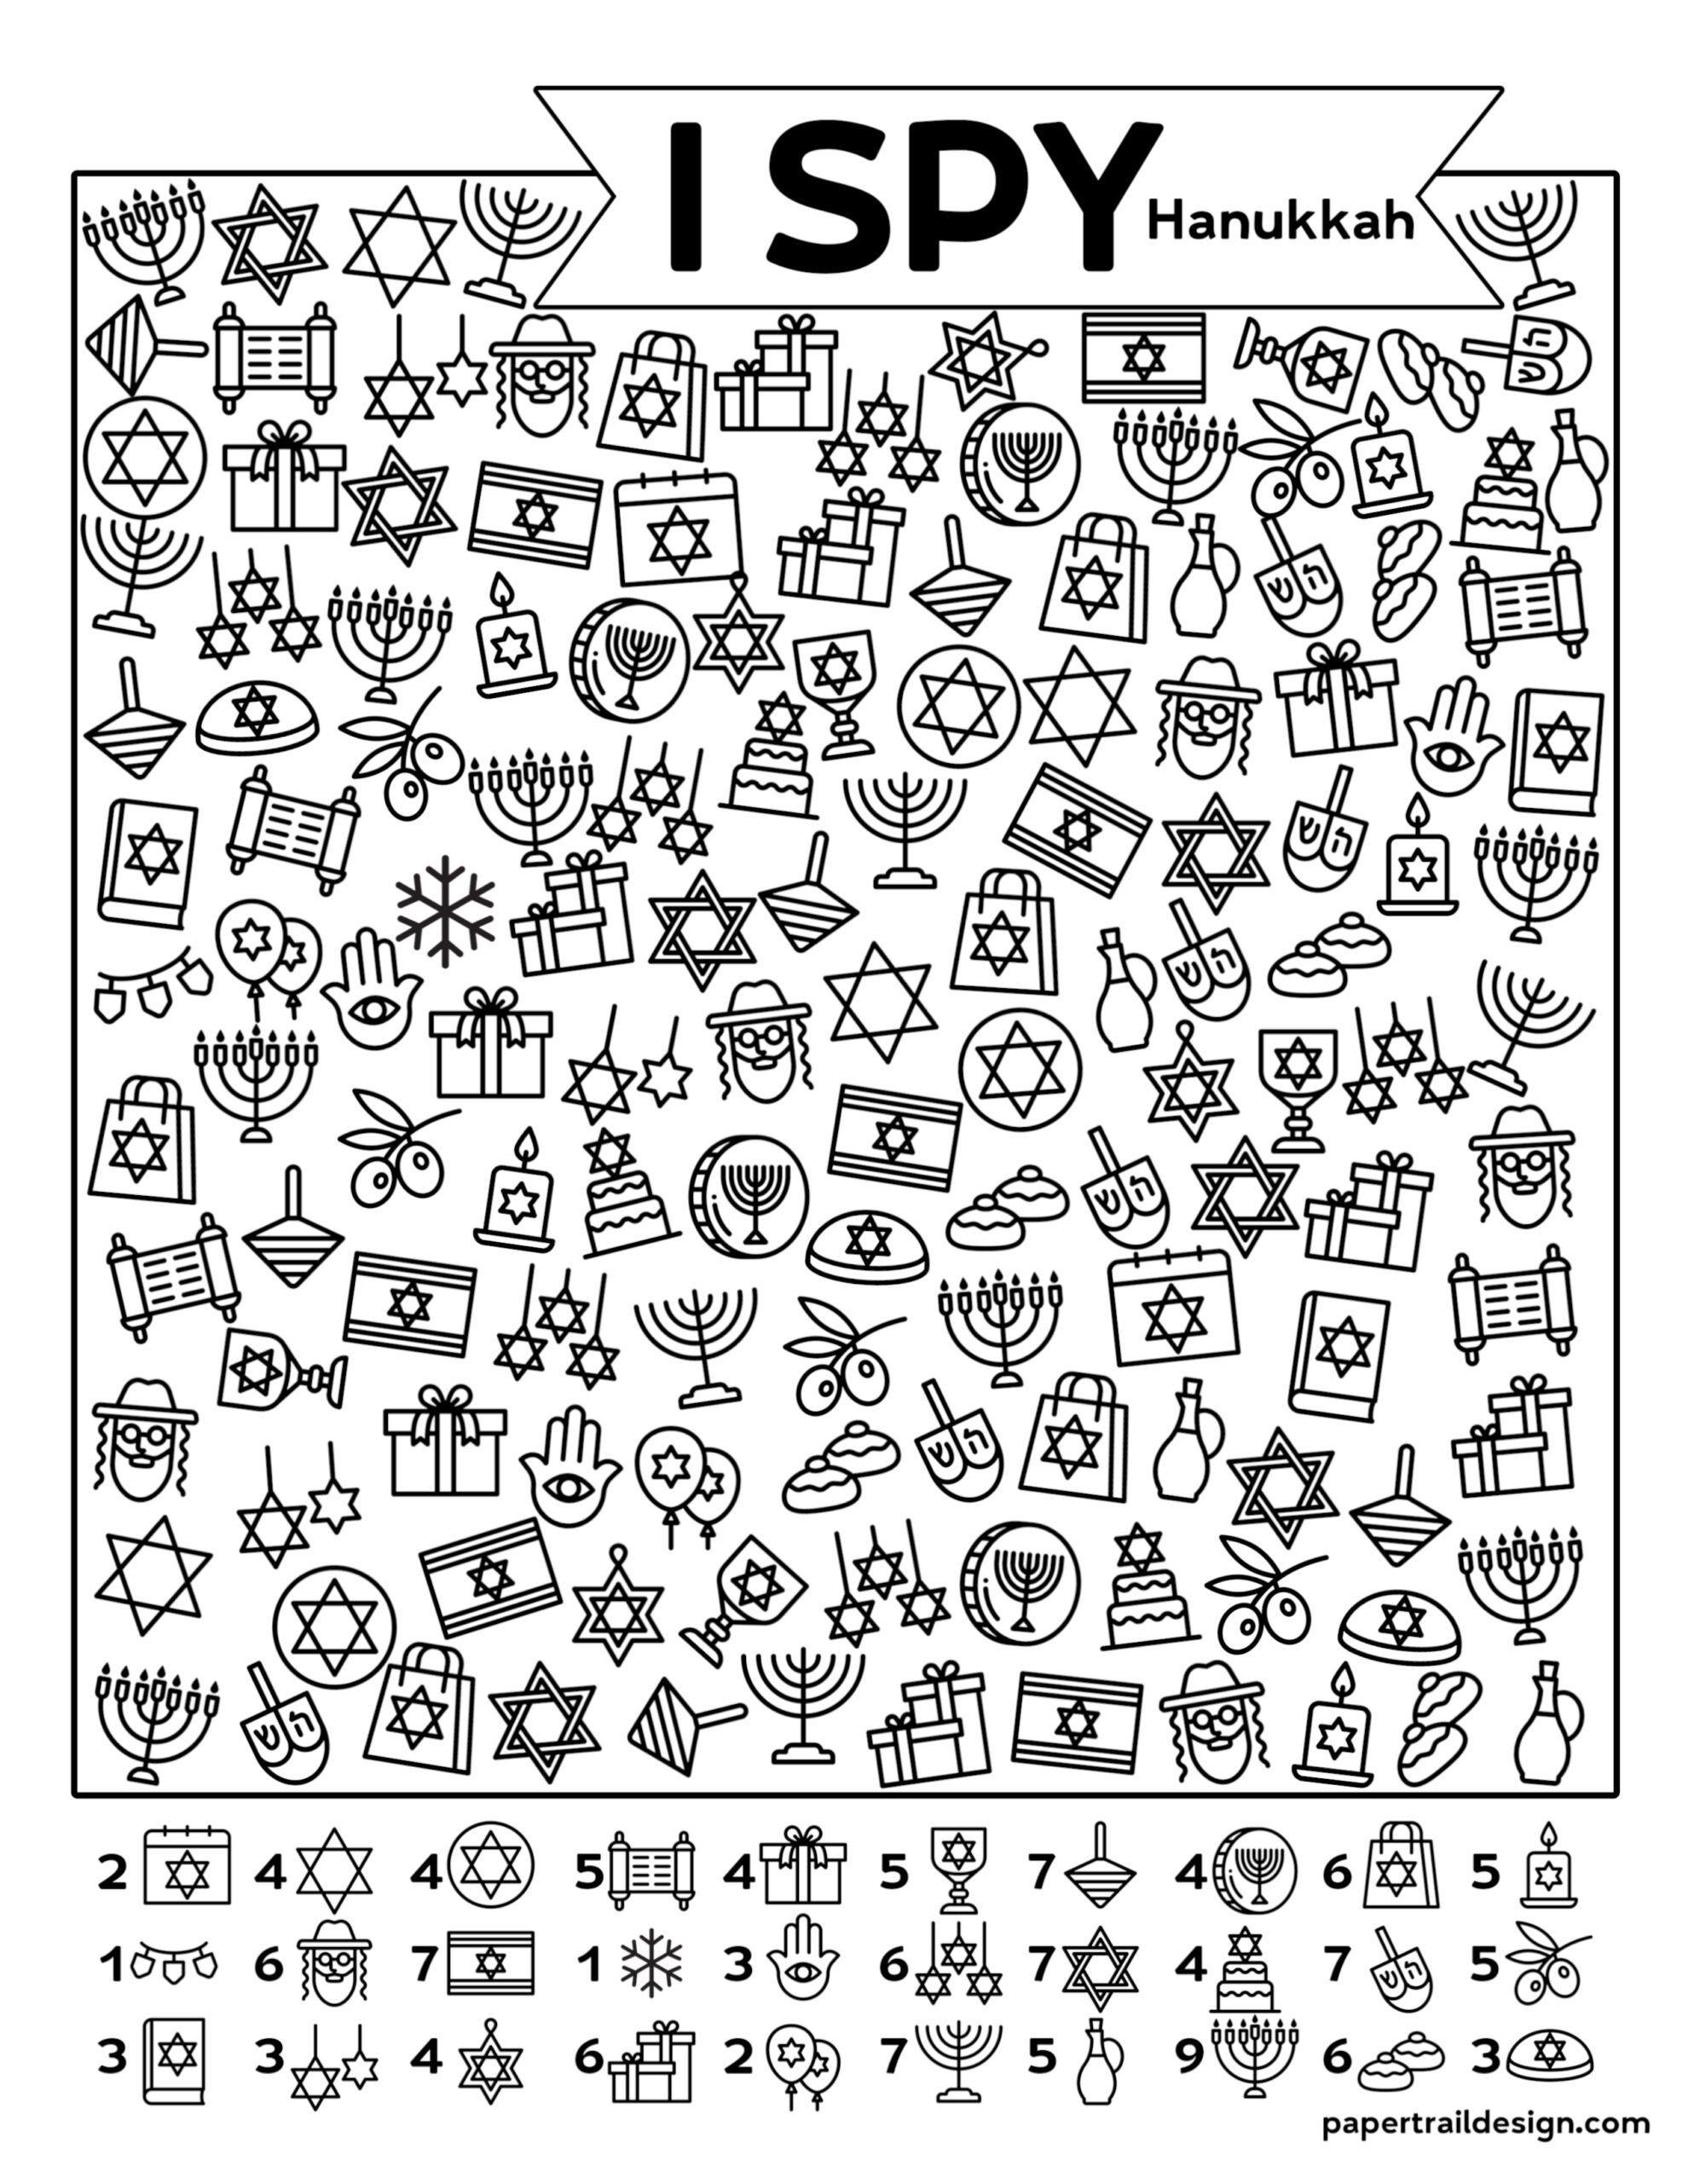 Free Printable I Spy Hanukkah Game Paper Trail Design Paper Trail Hanukkah For Kids Kids Hanukkah Crafts [ 2562 x 1980 Pixel ]